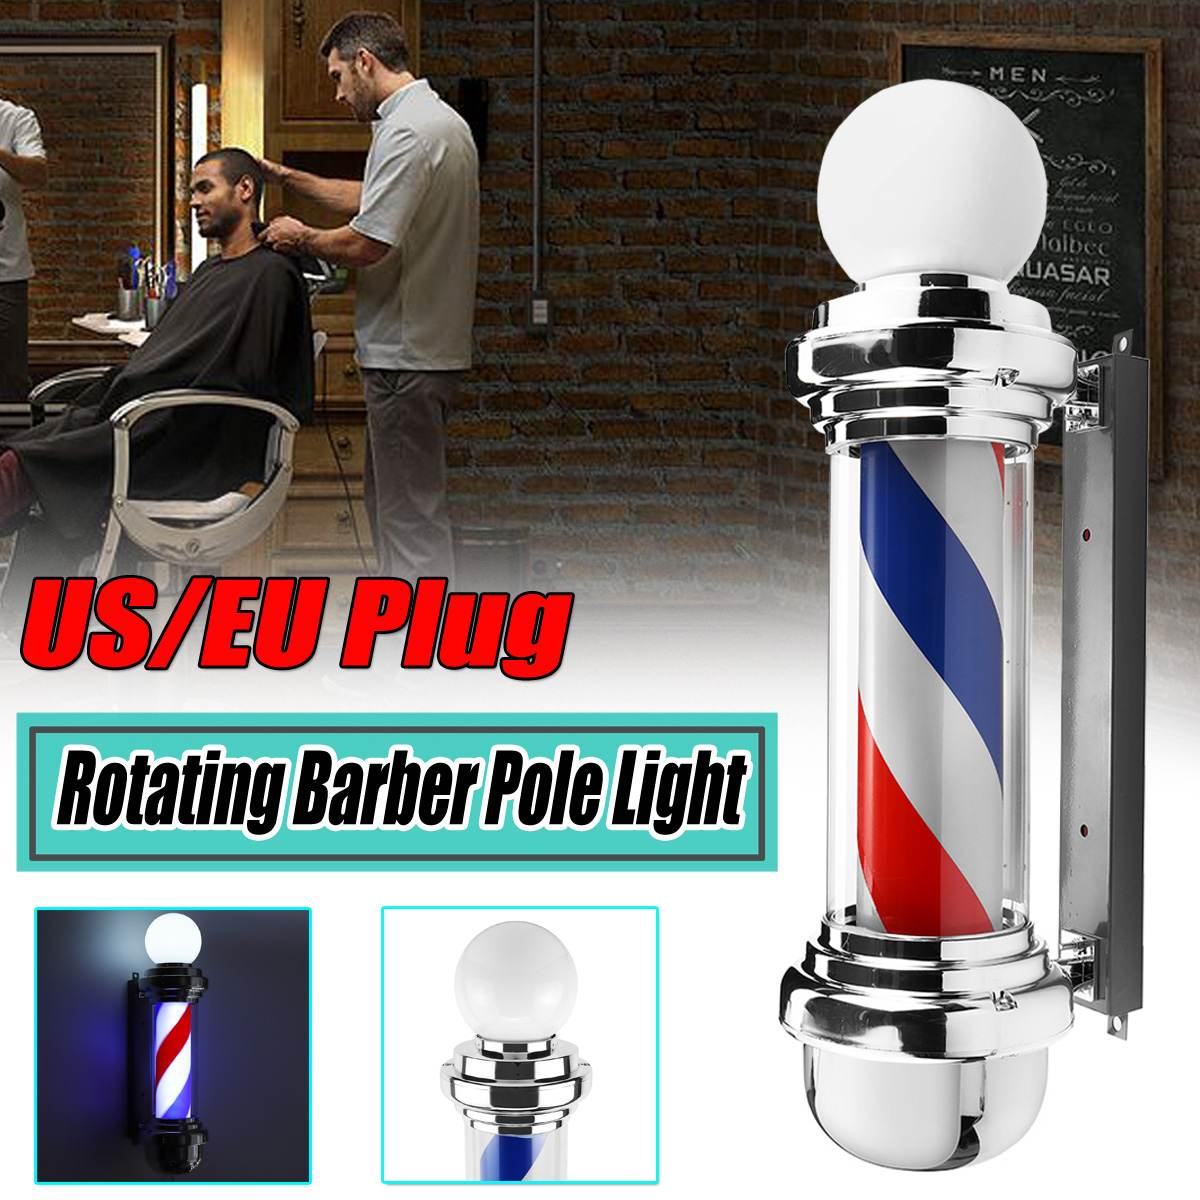 Hair Salon Light Barber Pole Led Light Rotating Light Lamp With Bulb Marker Lamp LED Downlights 68x19x24cm 220V EU/110V US Plug